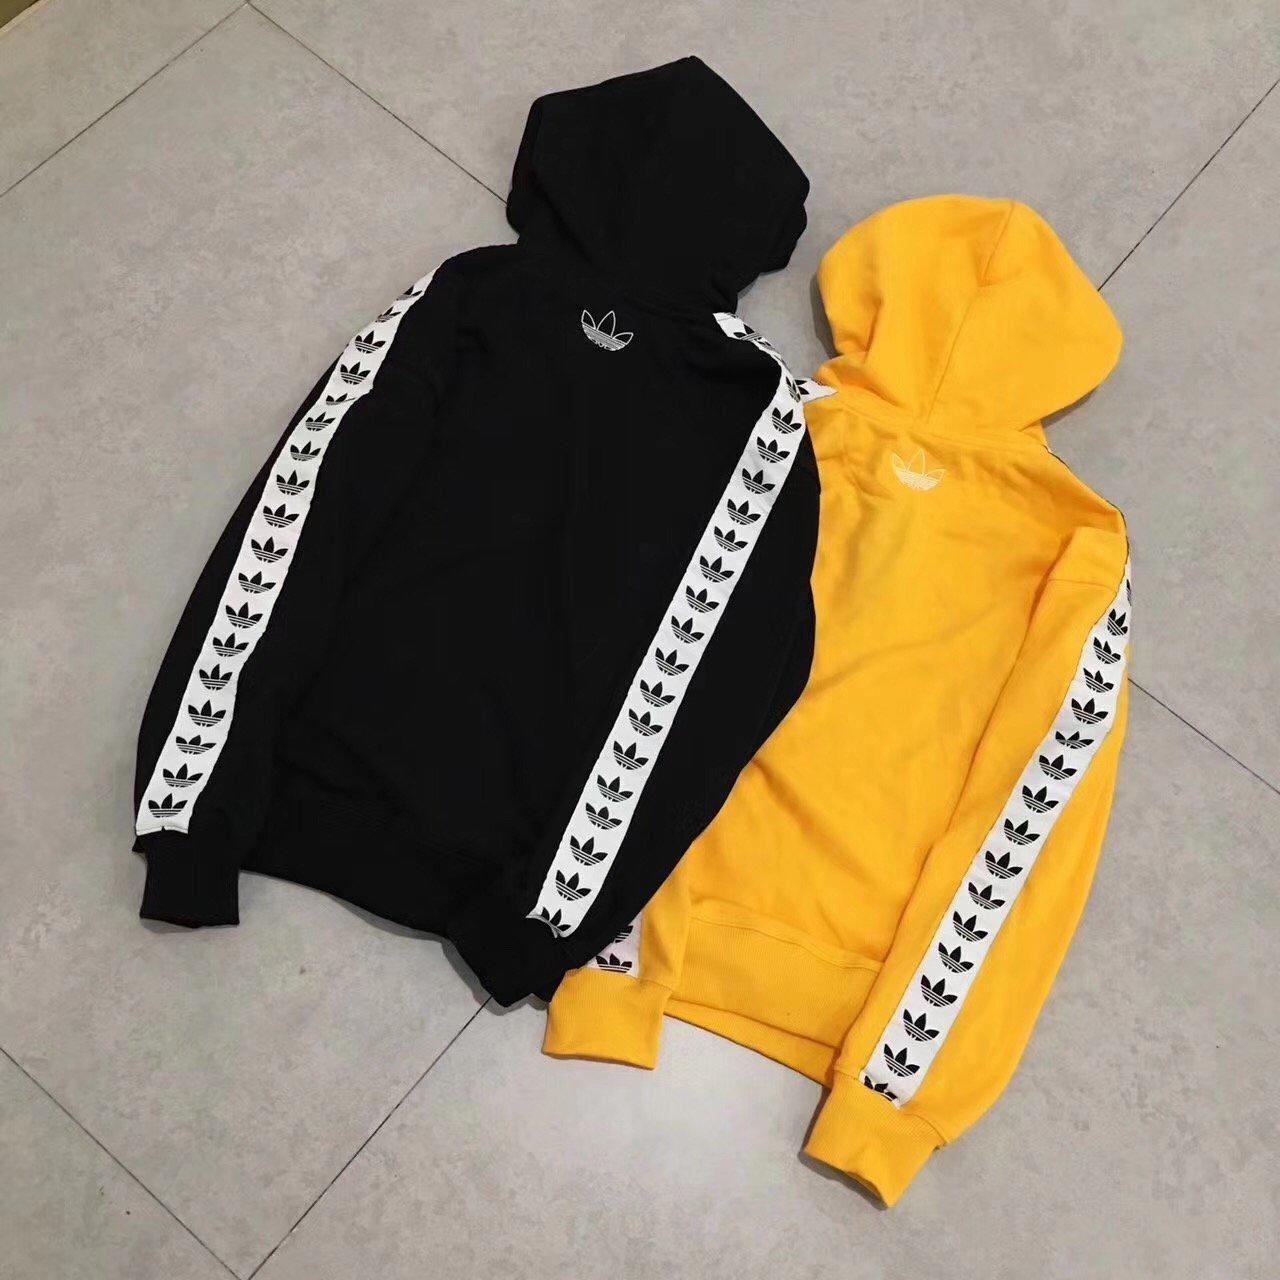 Observatorio Nuez datos  Full size | Adidas outfit, Adidas hoodie outfit, Adidas outfit men